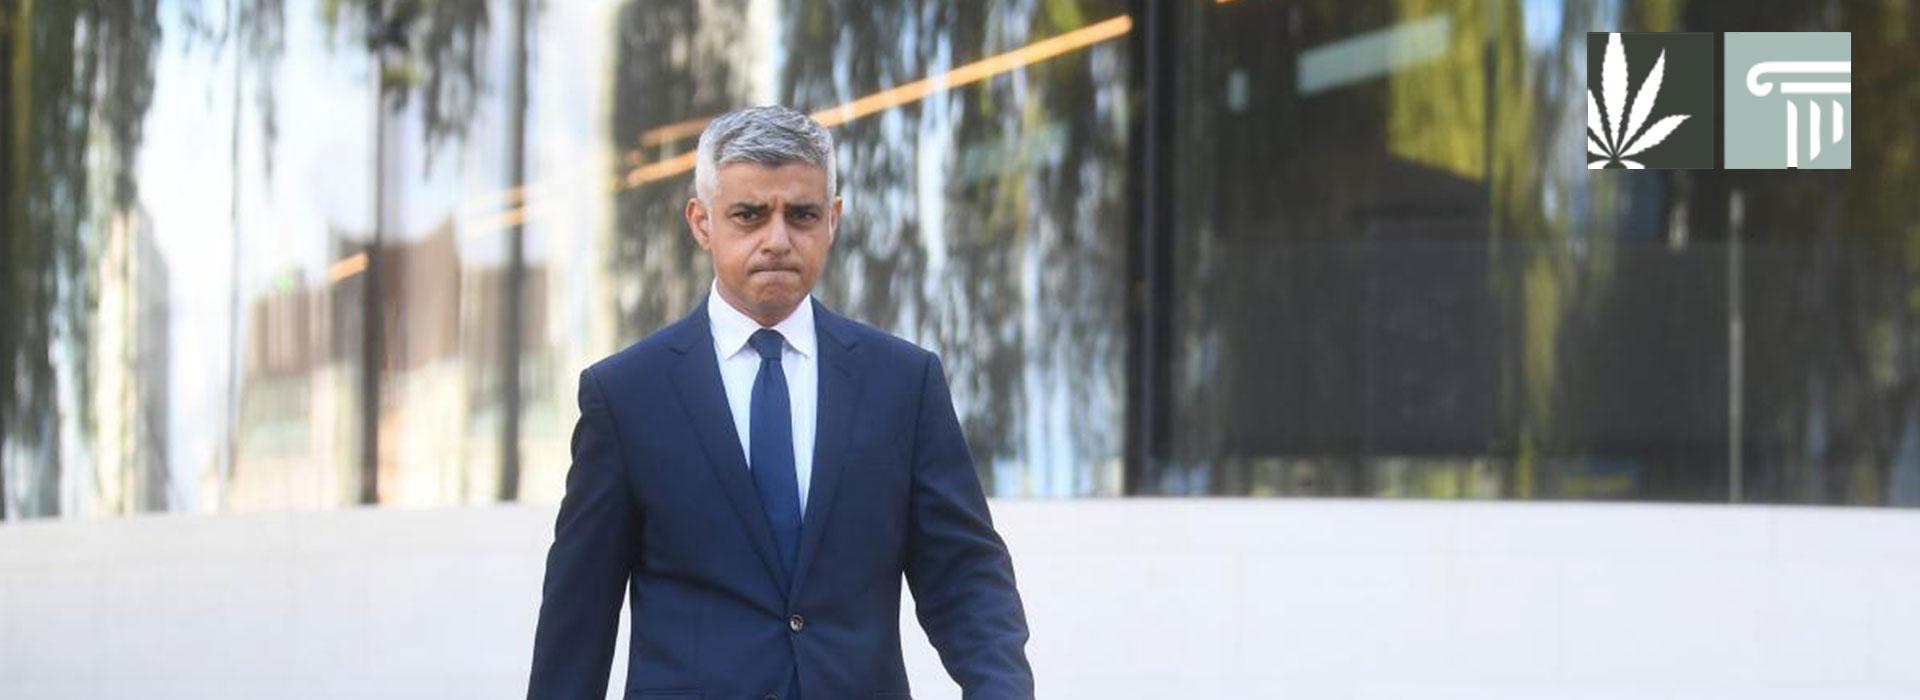 London Mayor Sadiq Khan Plans Commission Study Cannabis Decriminalization 2